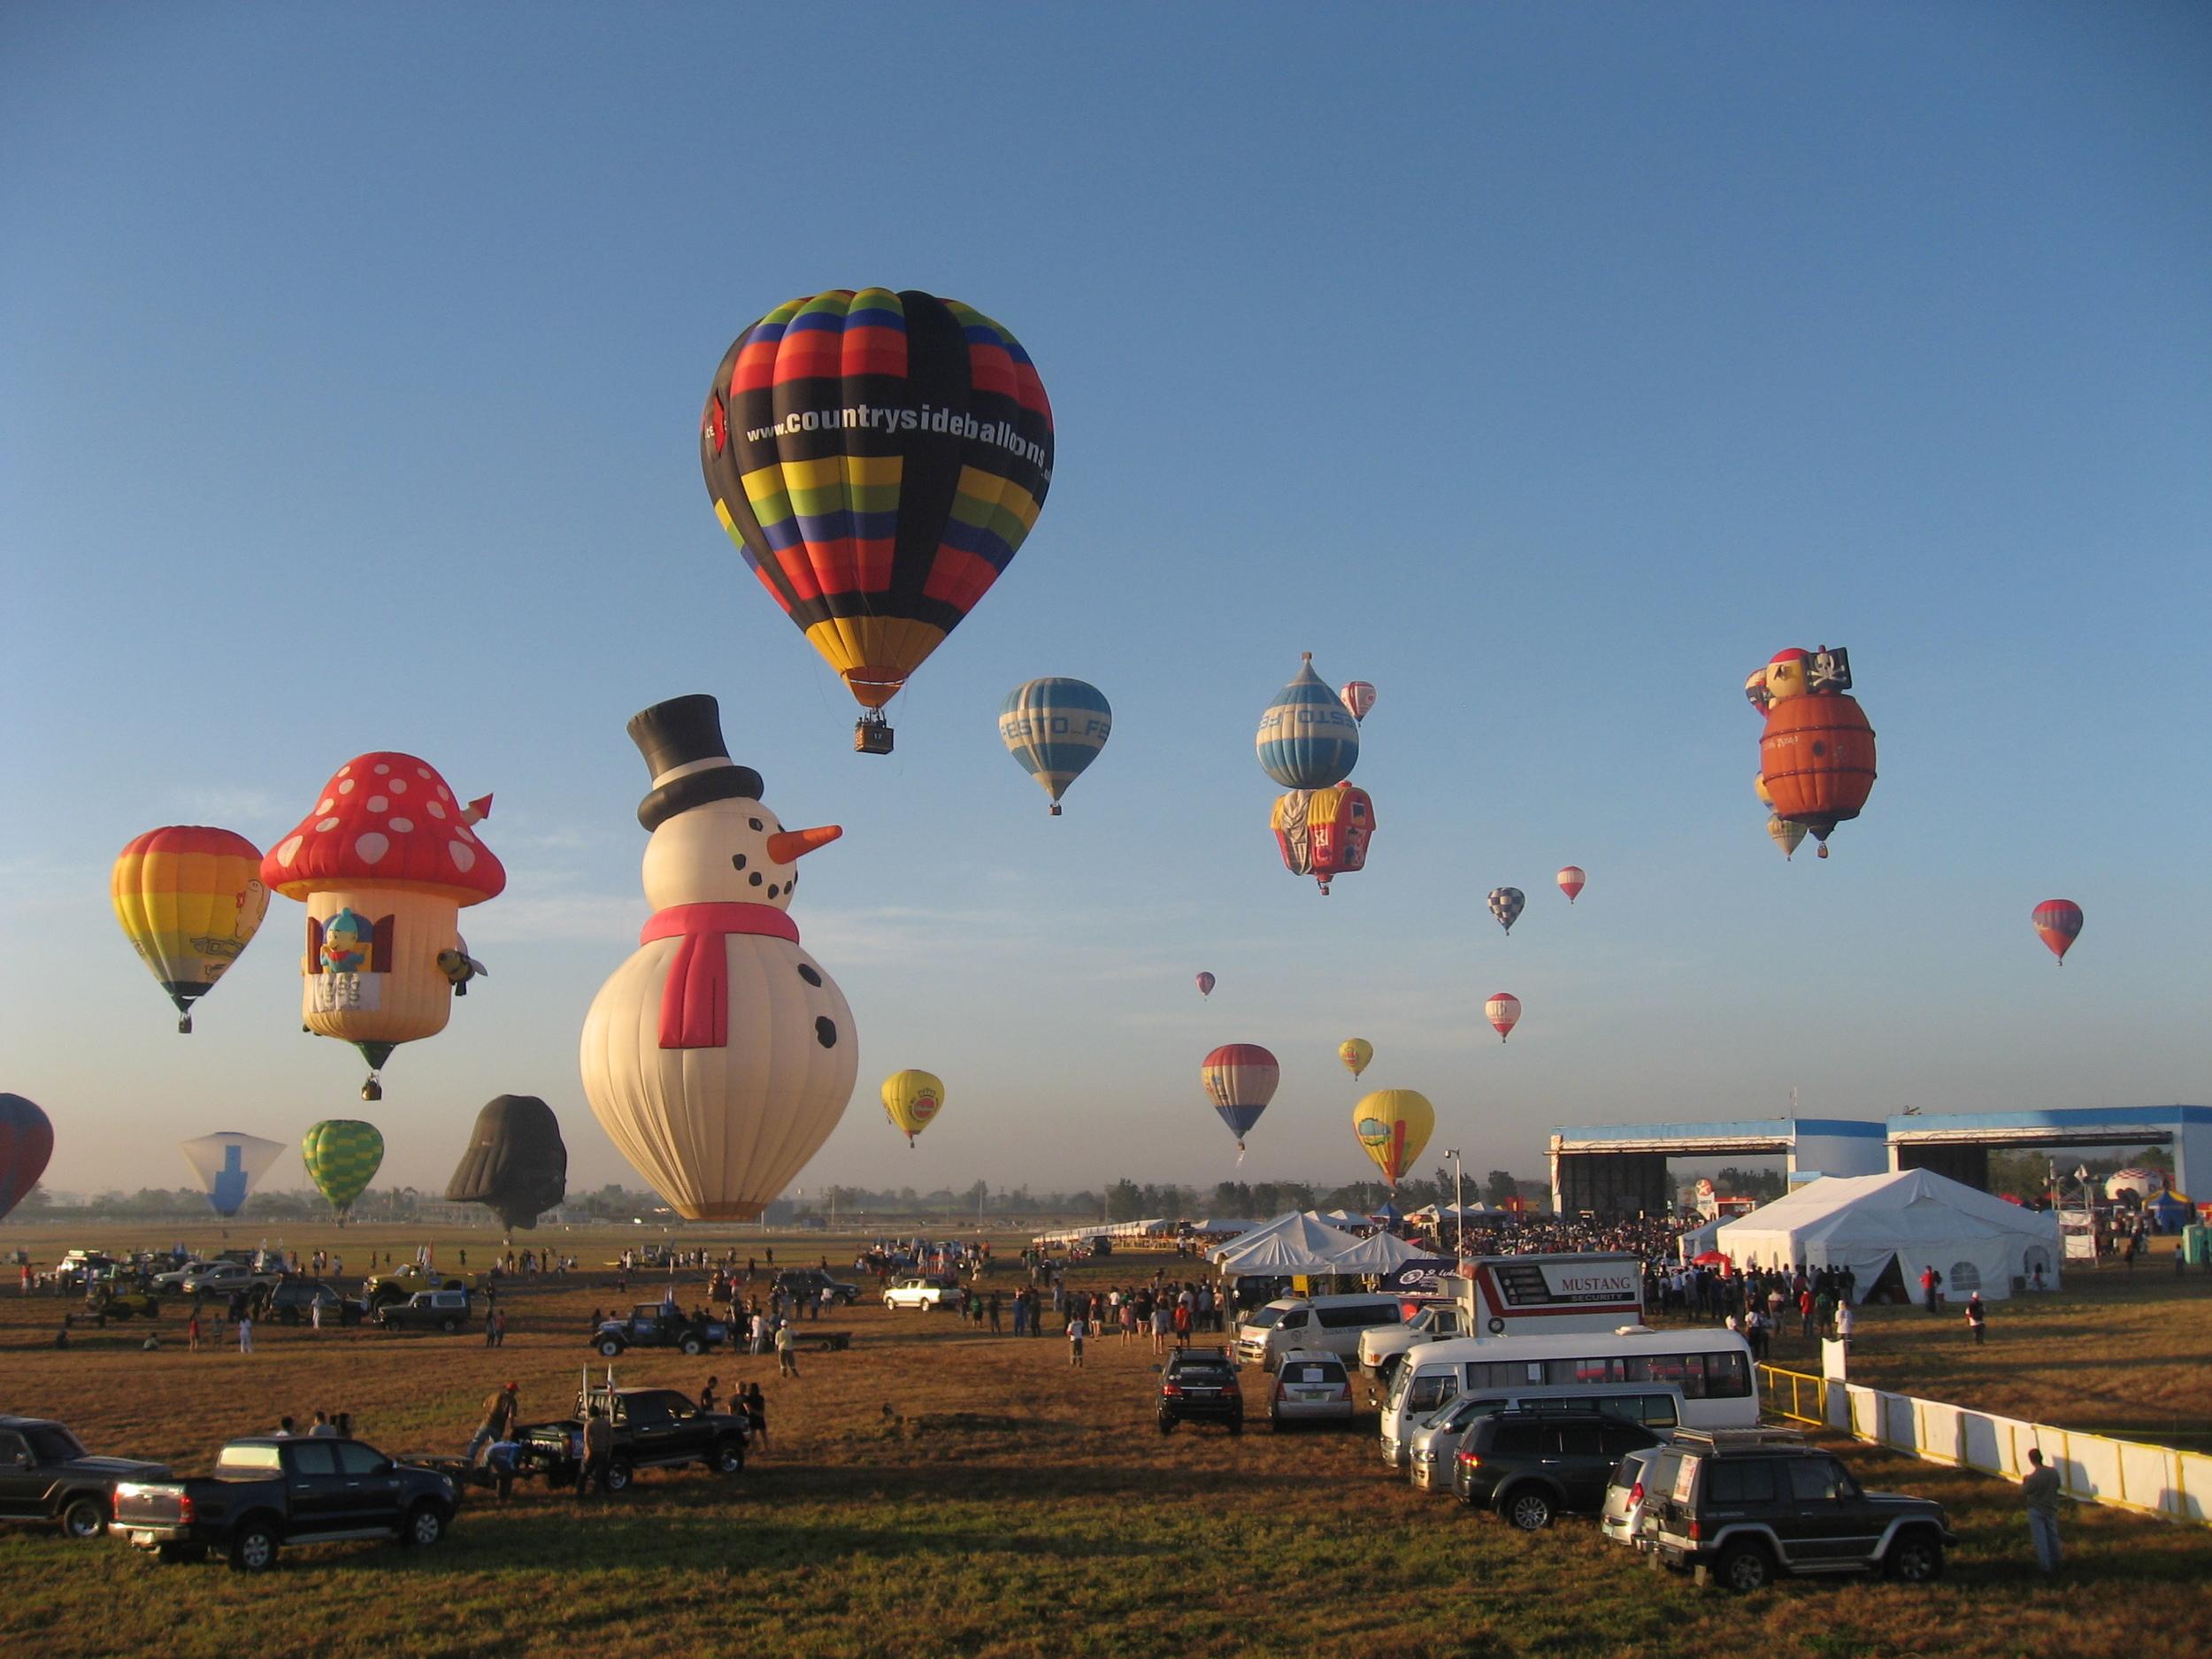 Clark Hot Air Balloon Festival, Phillippines